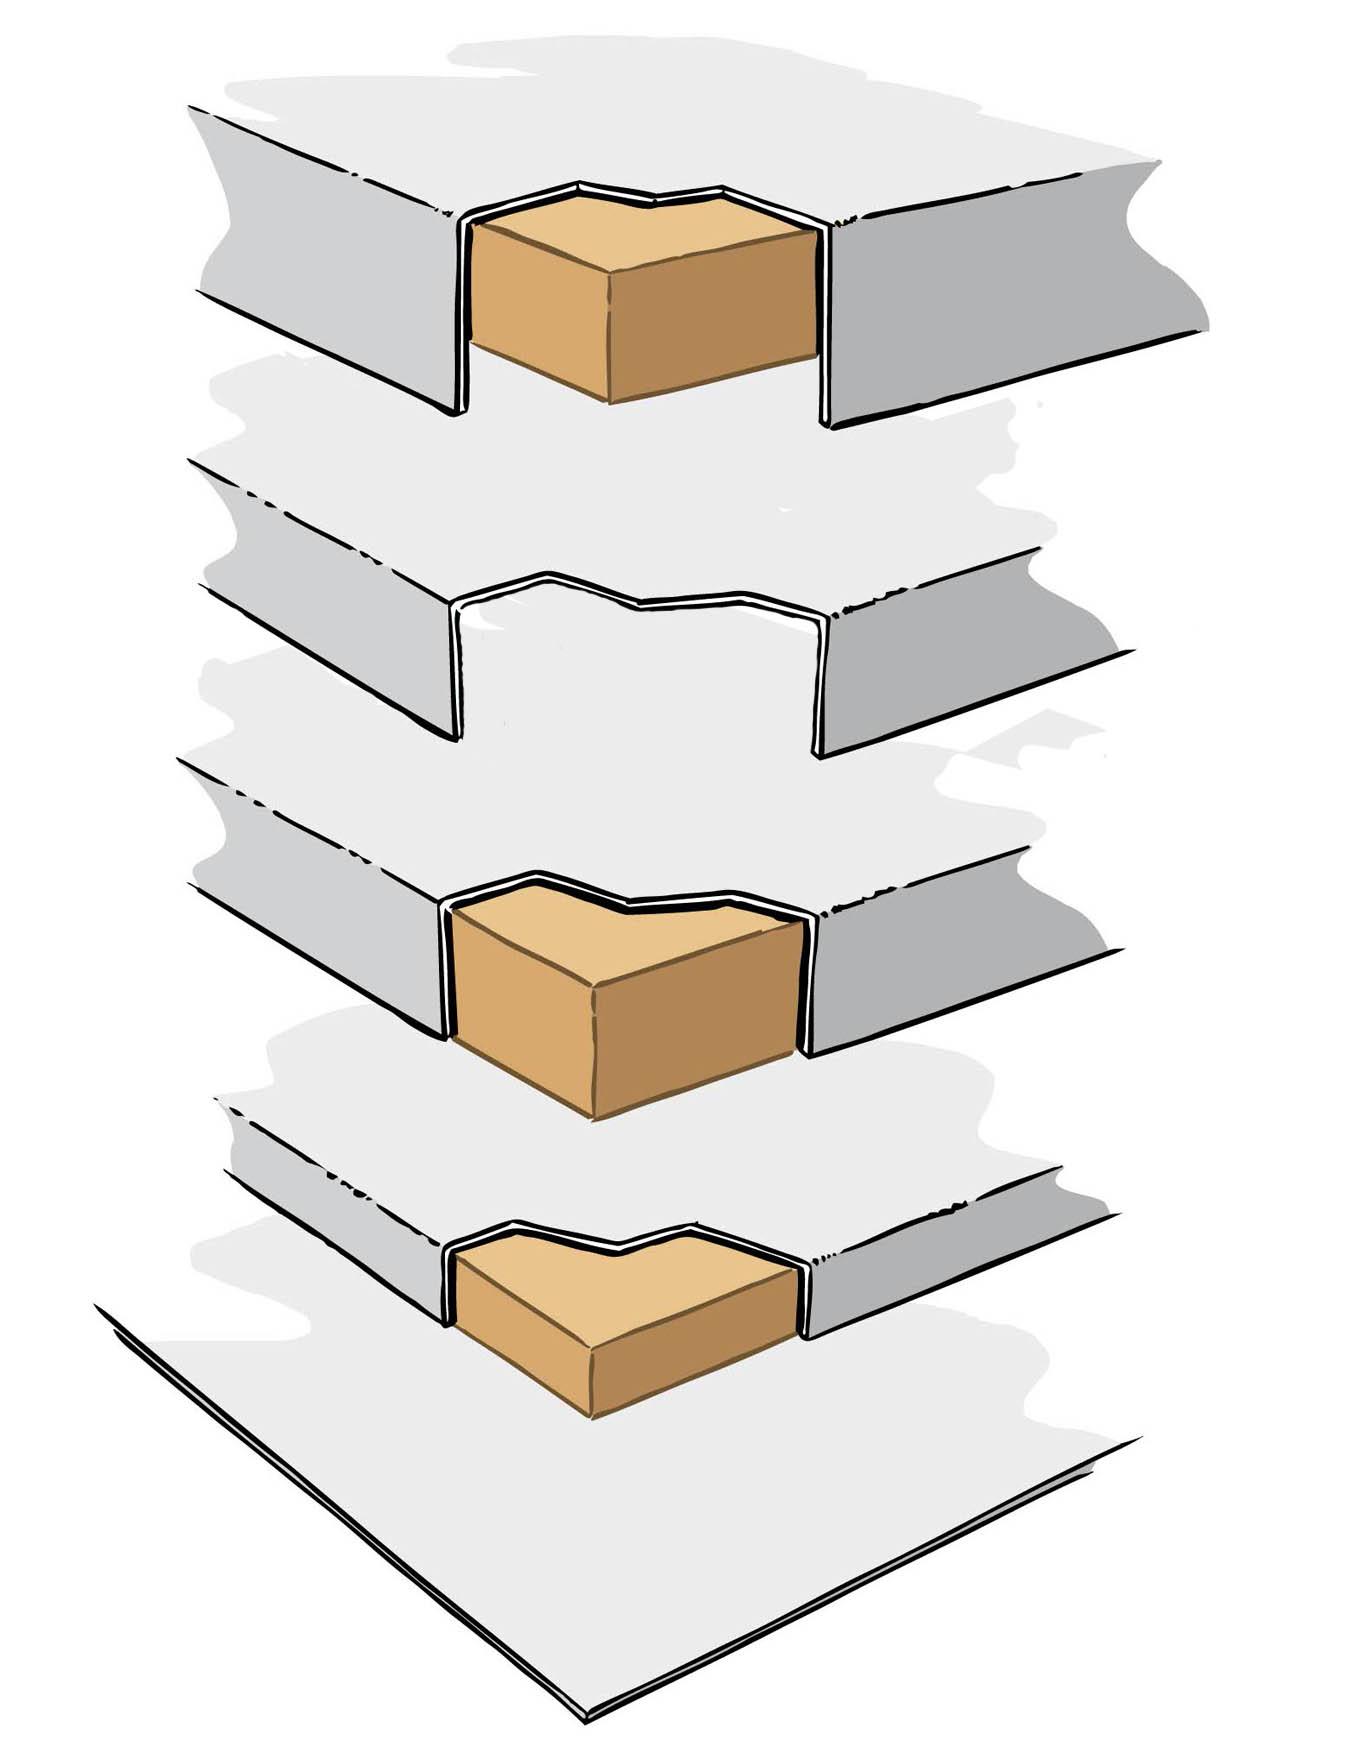 Home inox plan de travail inox massif 6 mm vibr - Plan de travail bois massif sur mesure ...